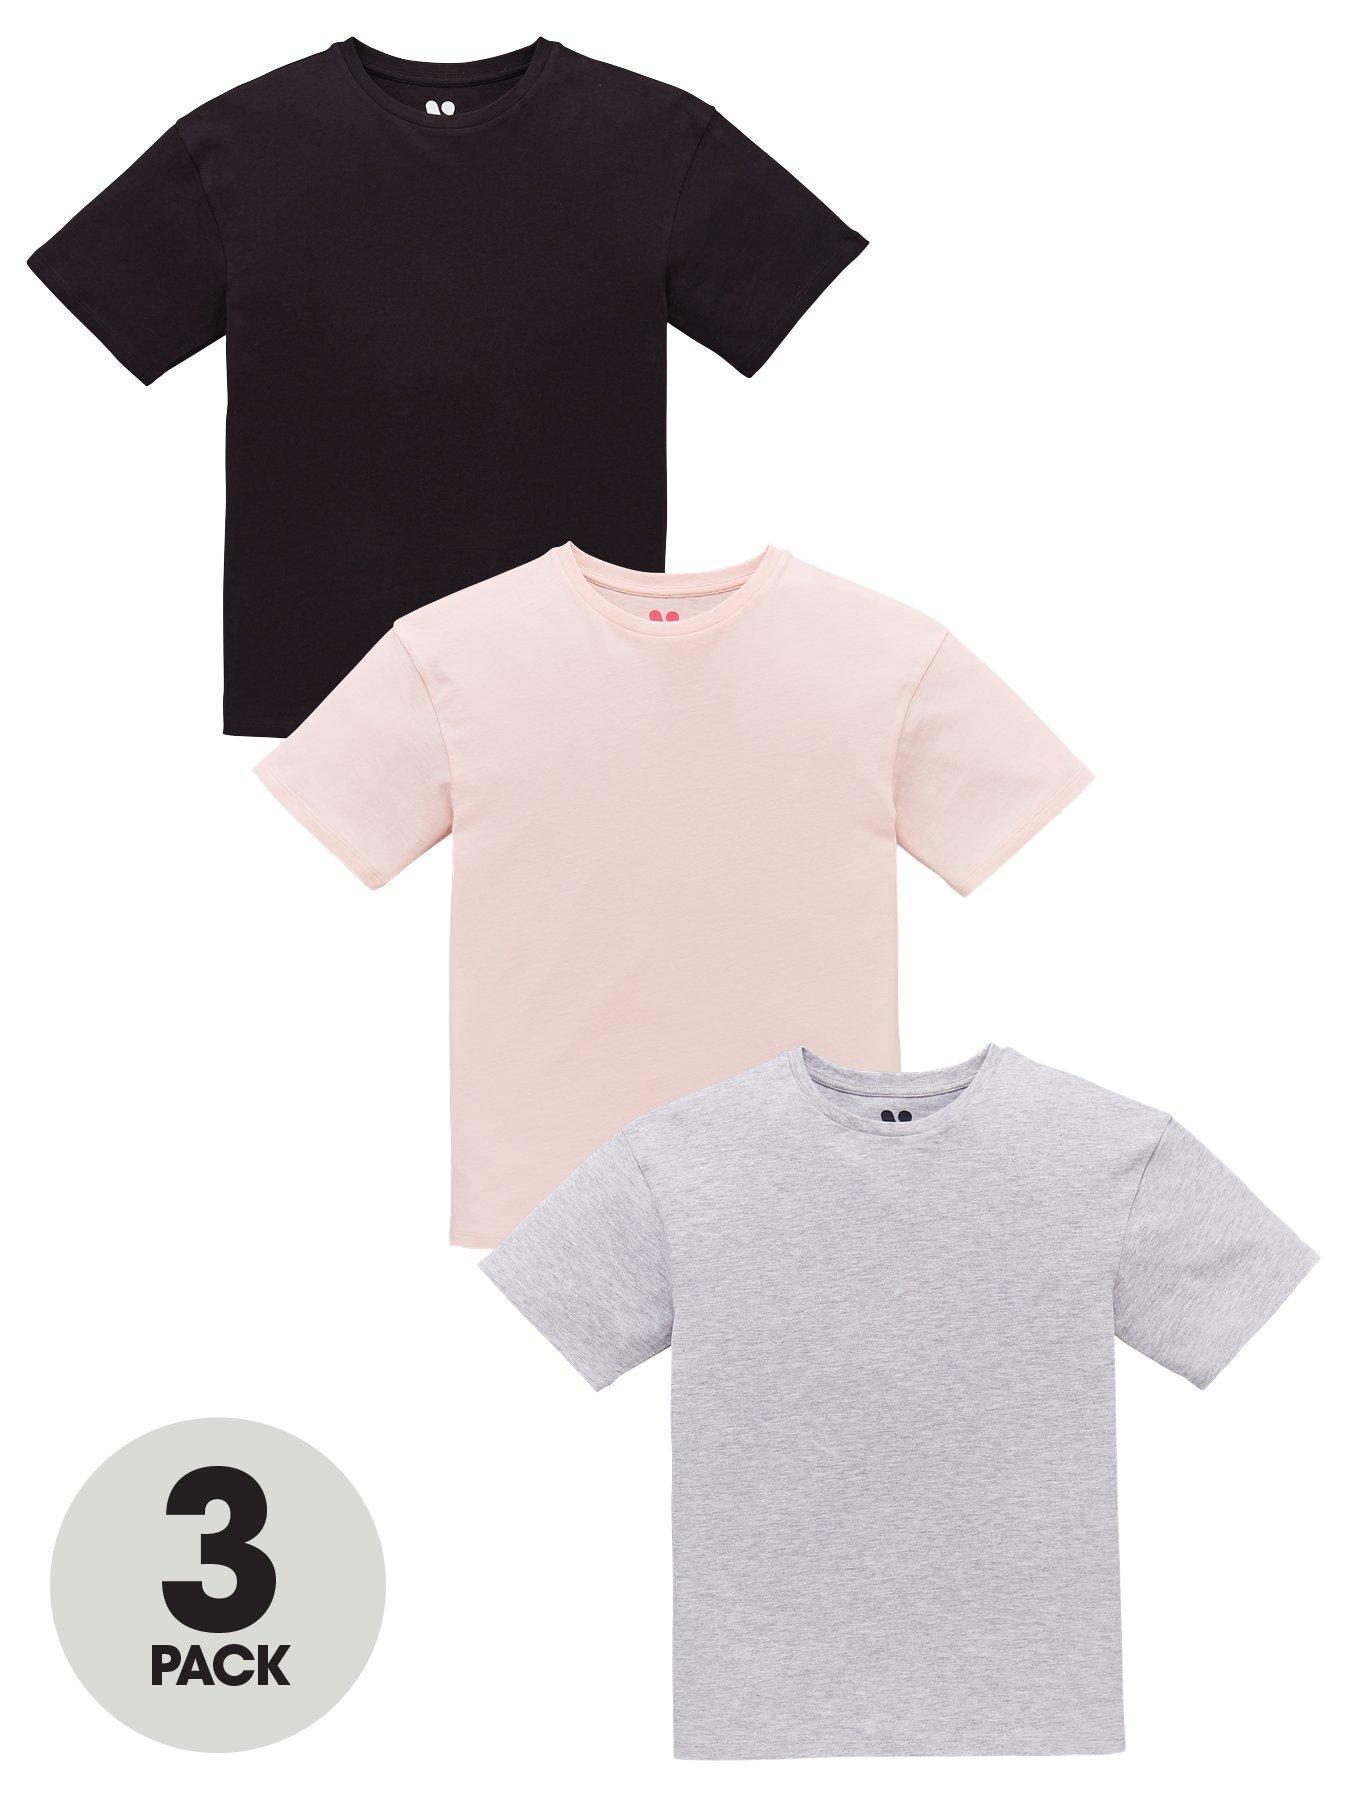 CREATOR Toddler Baby Girl Ruffle Sleeve Shirt Basic Plain Cotton T-Shirts Tops Tee Clothes